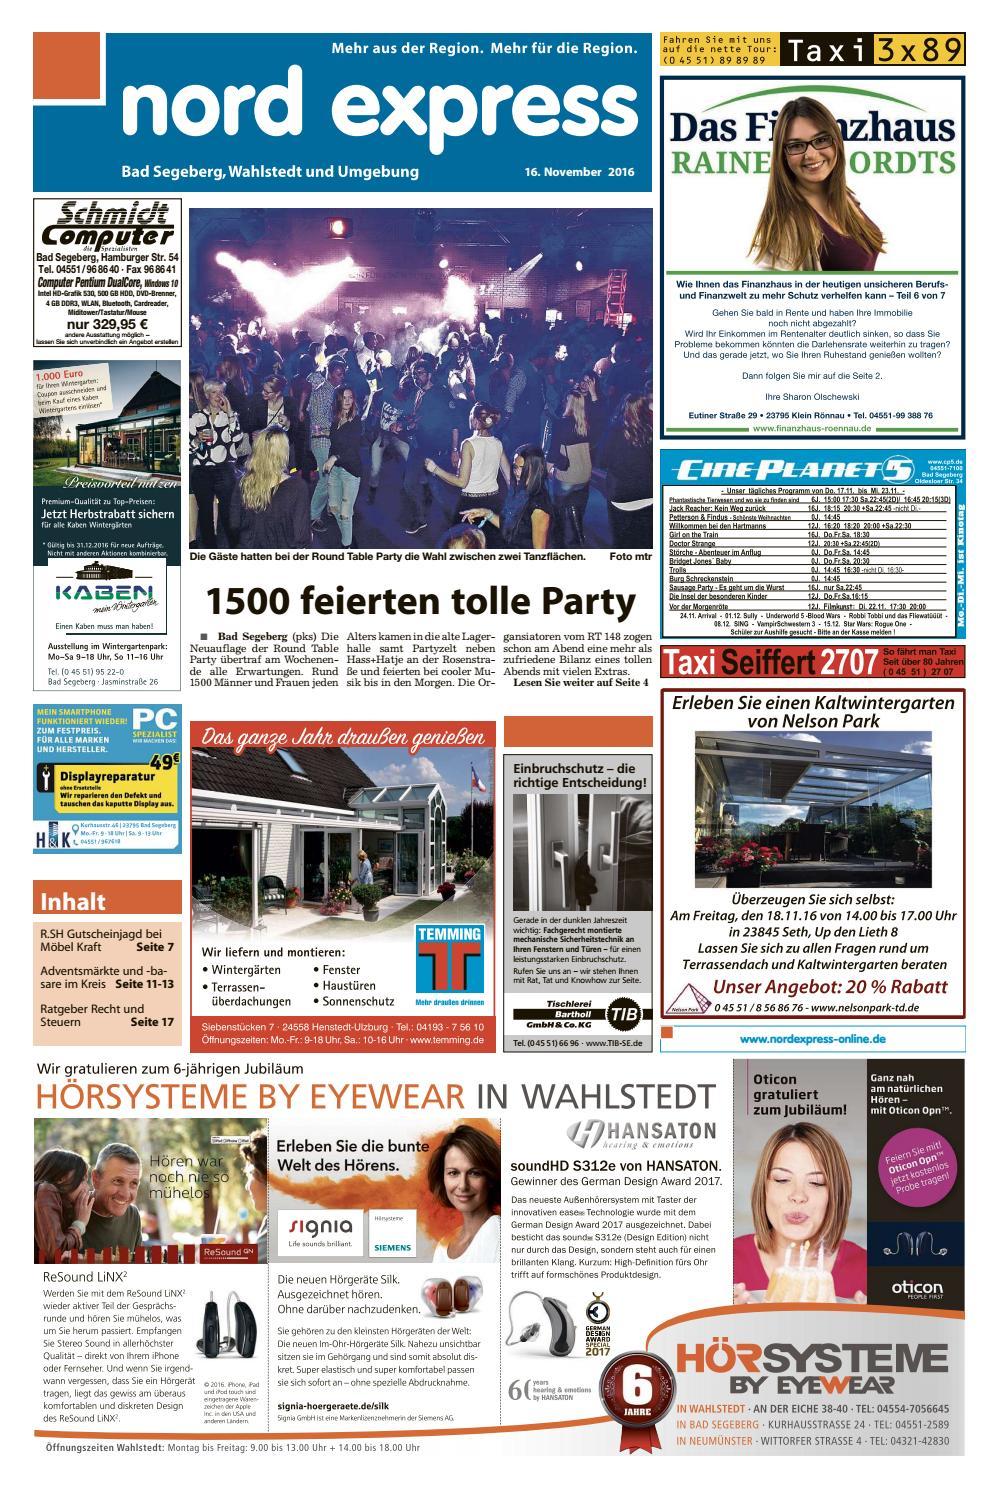 nord express segeberg by nordexpress-online.de - issuu